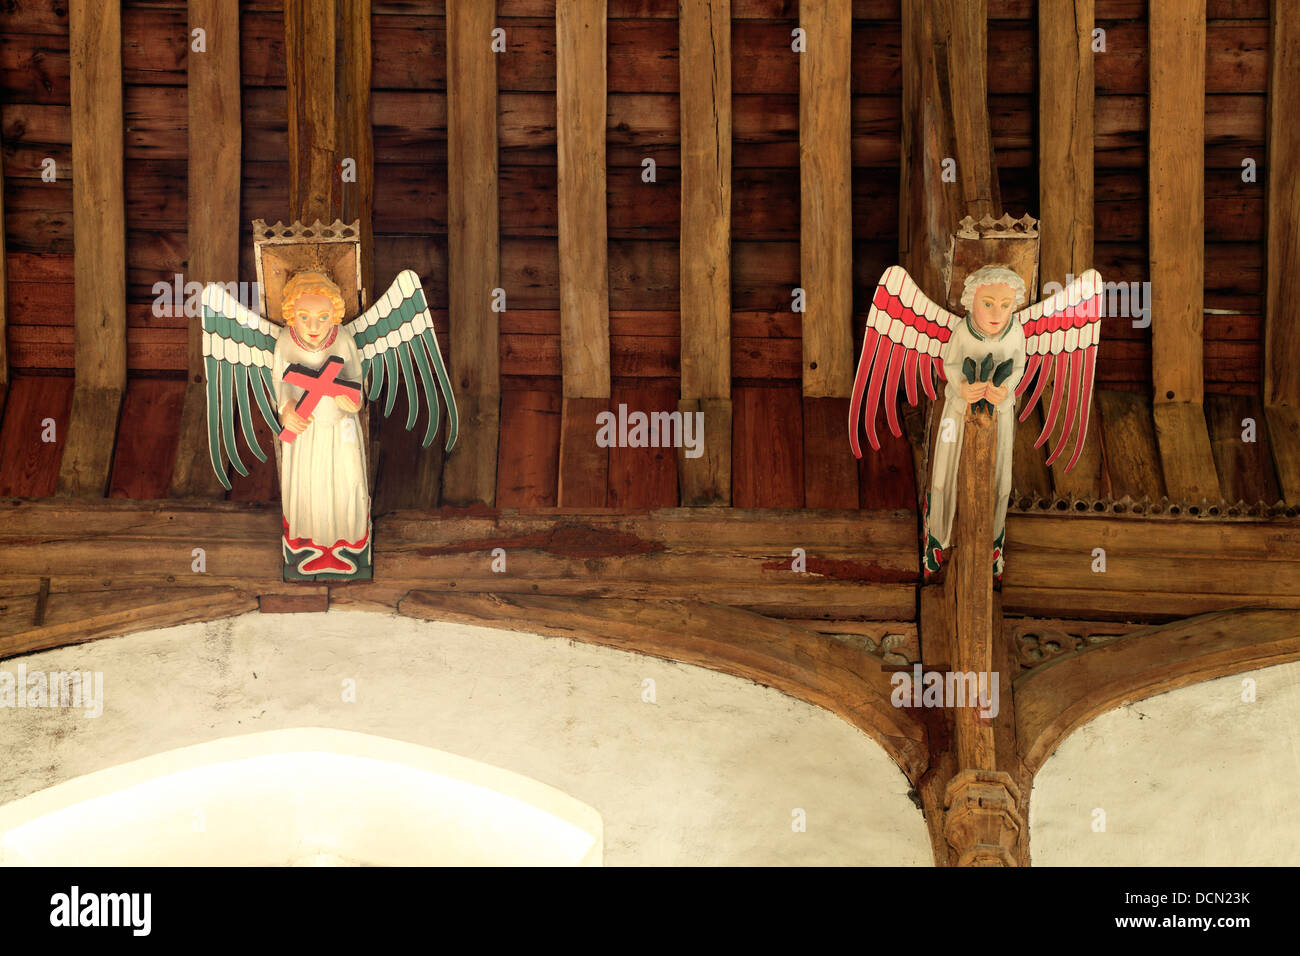 South Creake iglesia medieval de techo hammerbeam, ángeles ángel, Norfolk, Inglaterra, techos de vigas Imagen De Stock